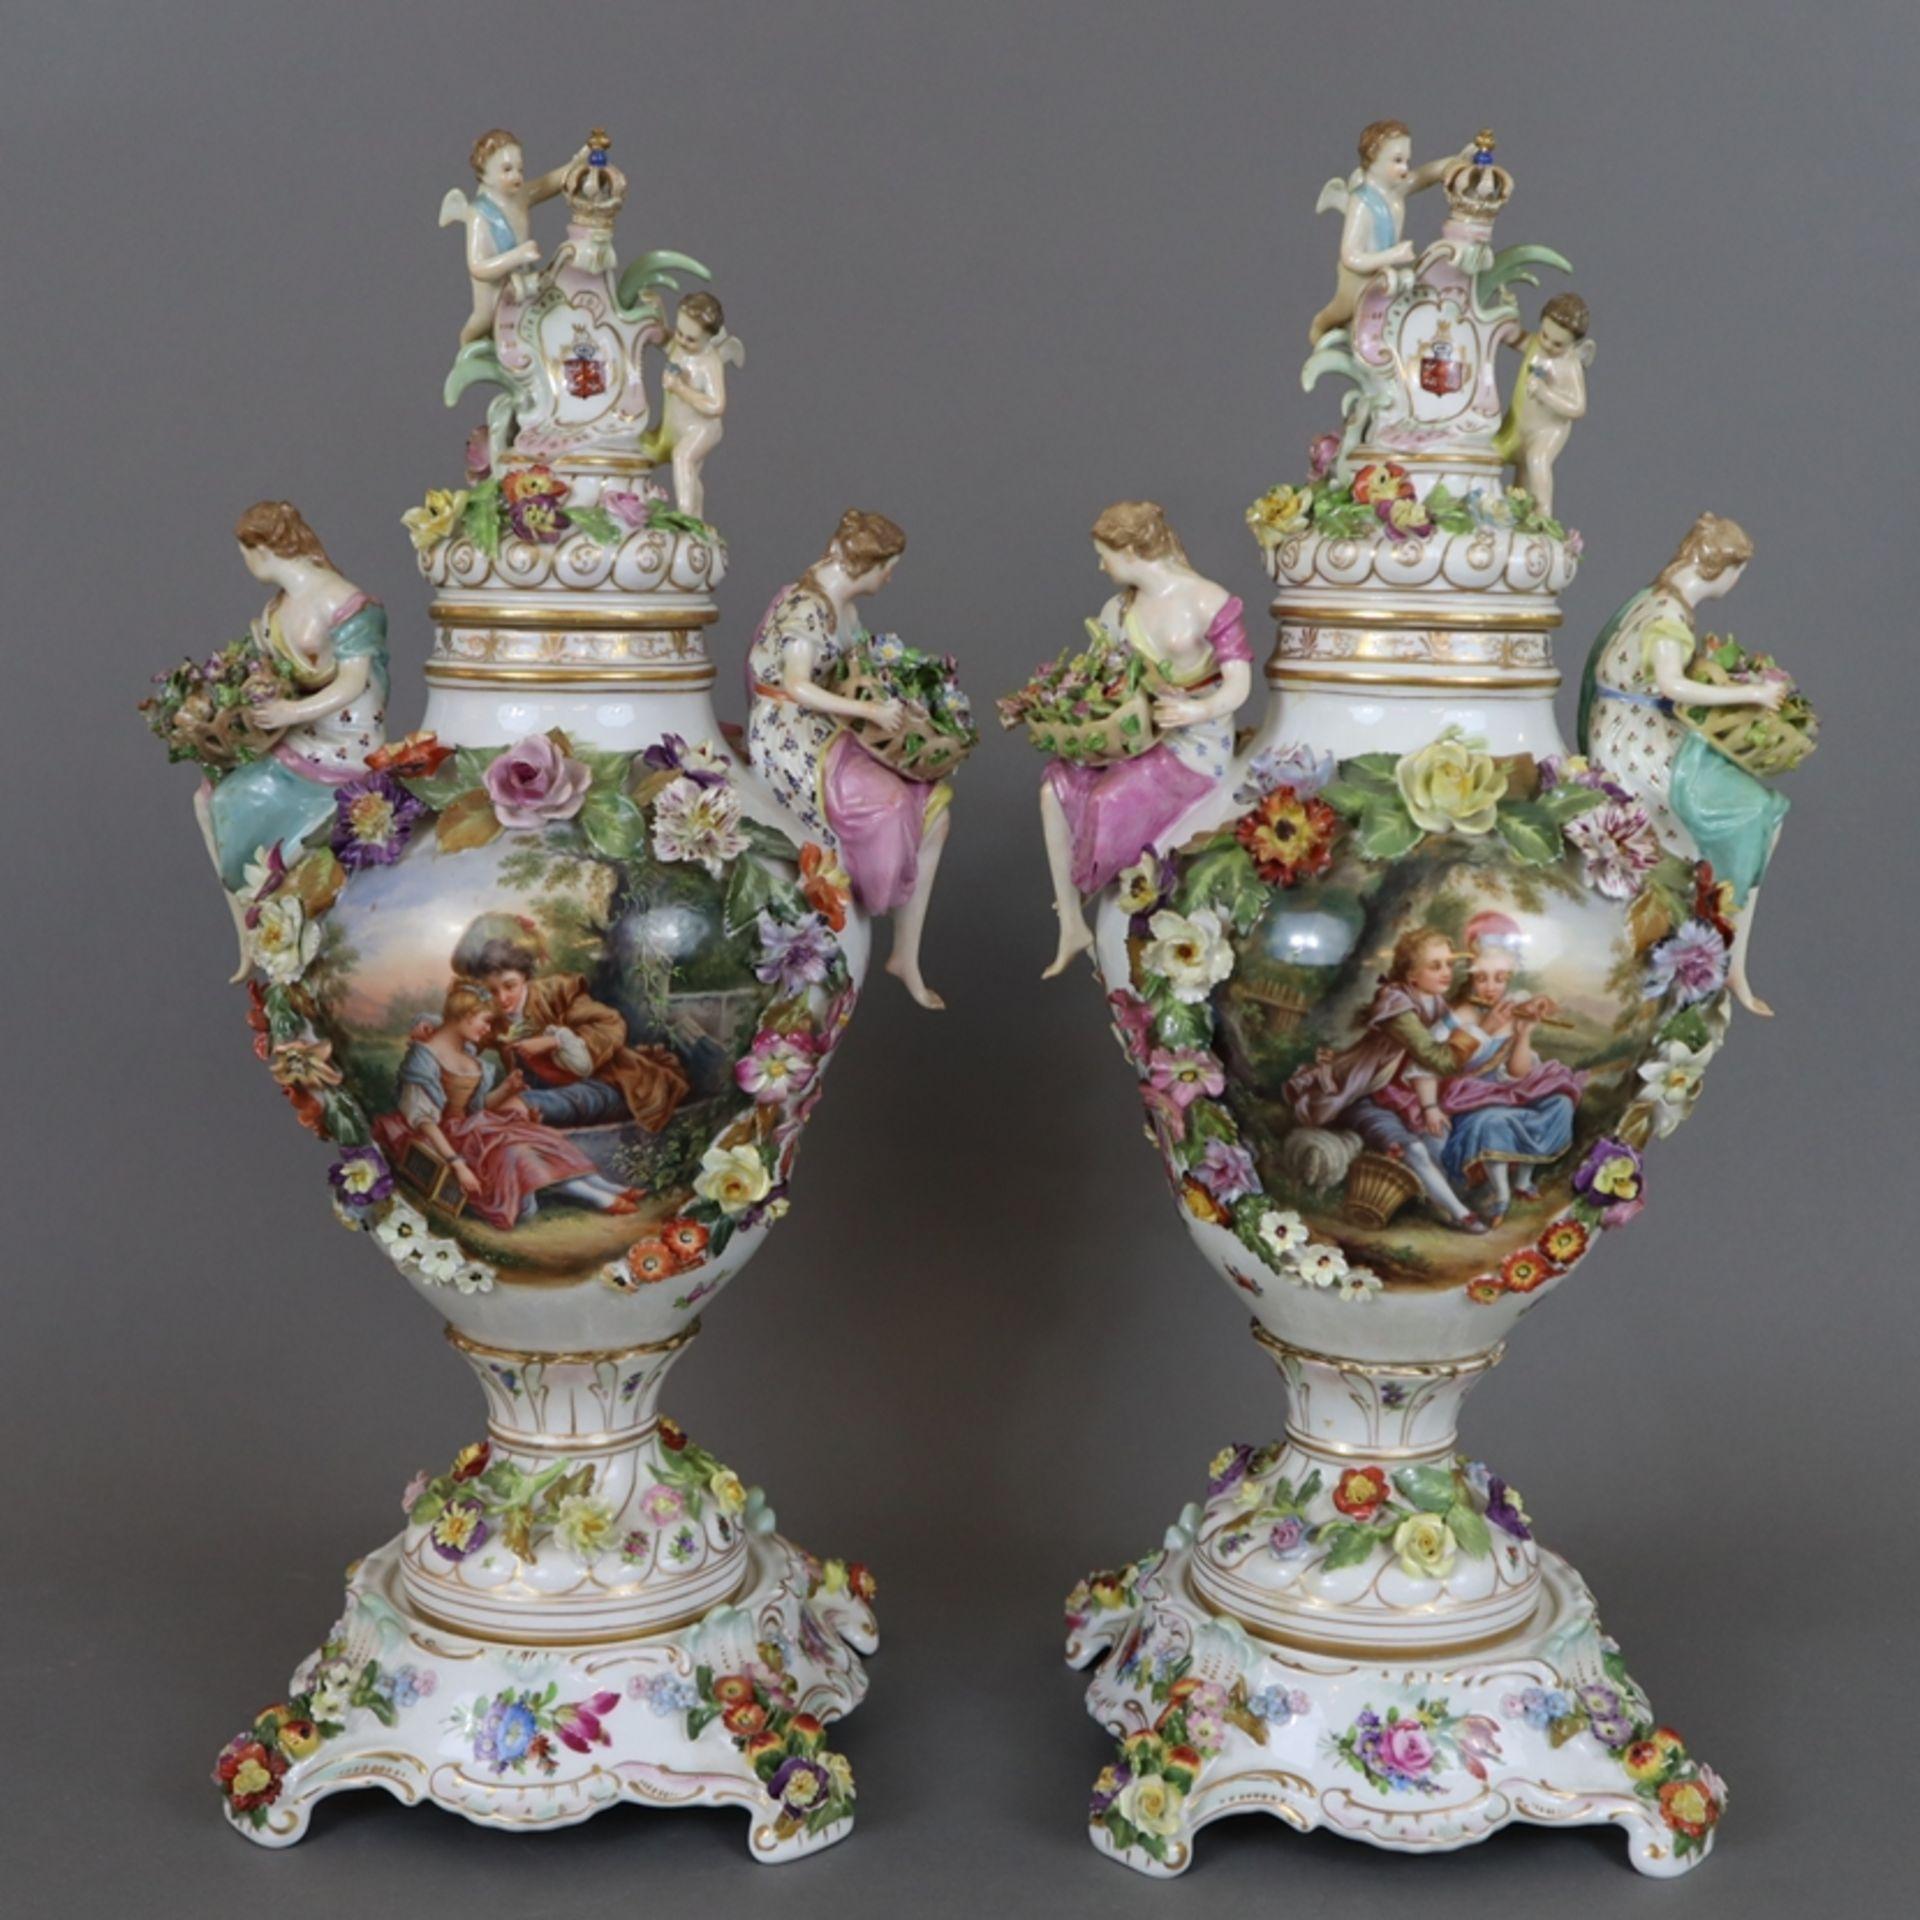 Paar prunkvolle Deckelvasen mit Sockel - Dresden/Potschappel, Marke ab 1901, Porzellan, reliefiert,